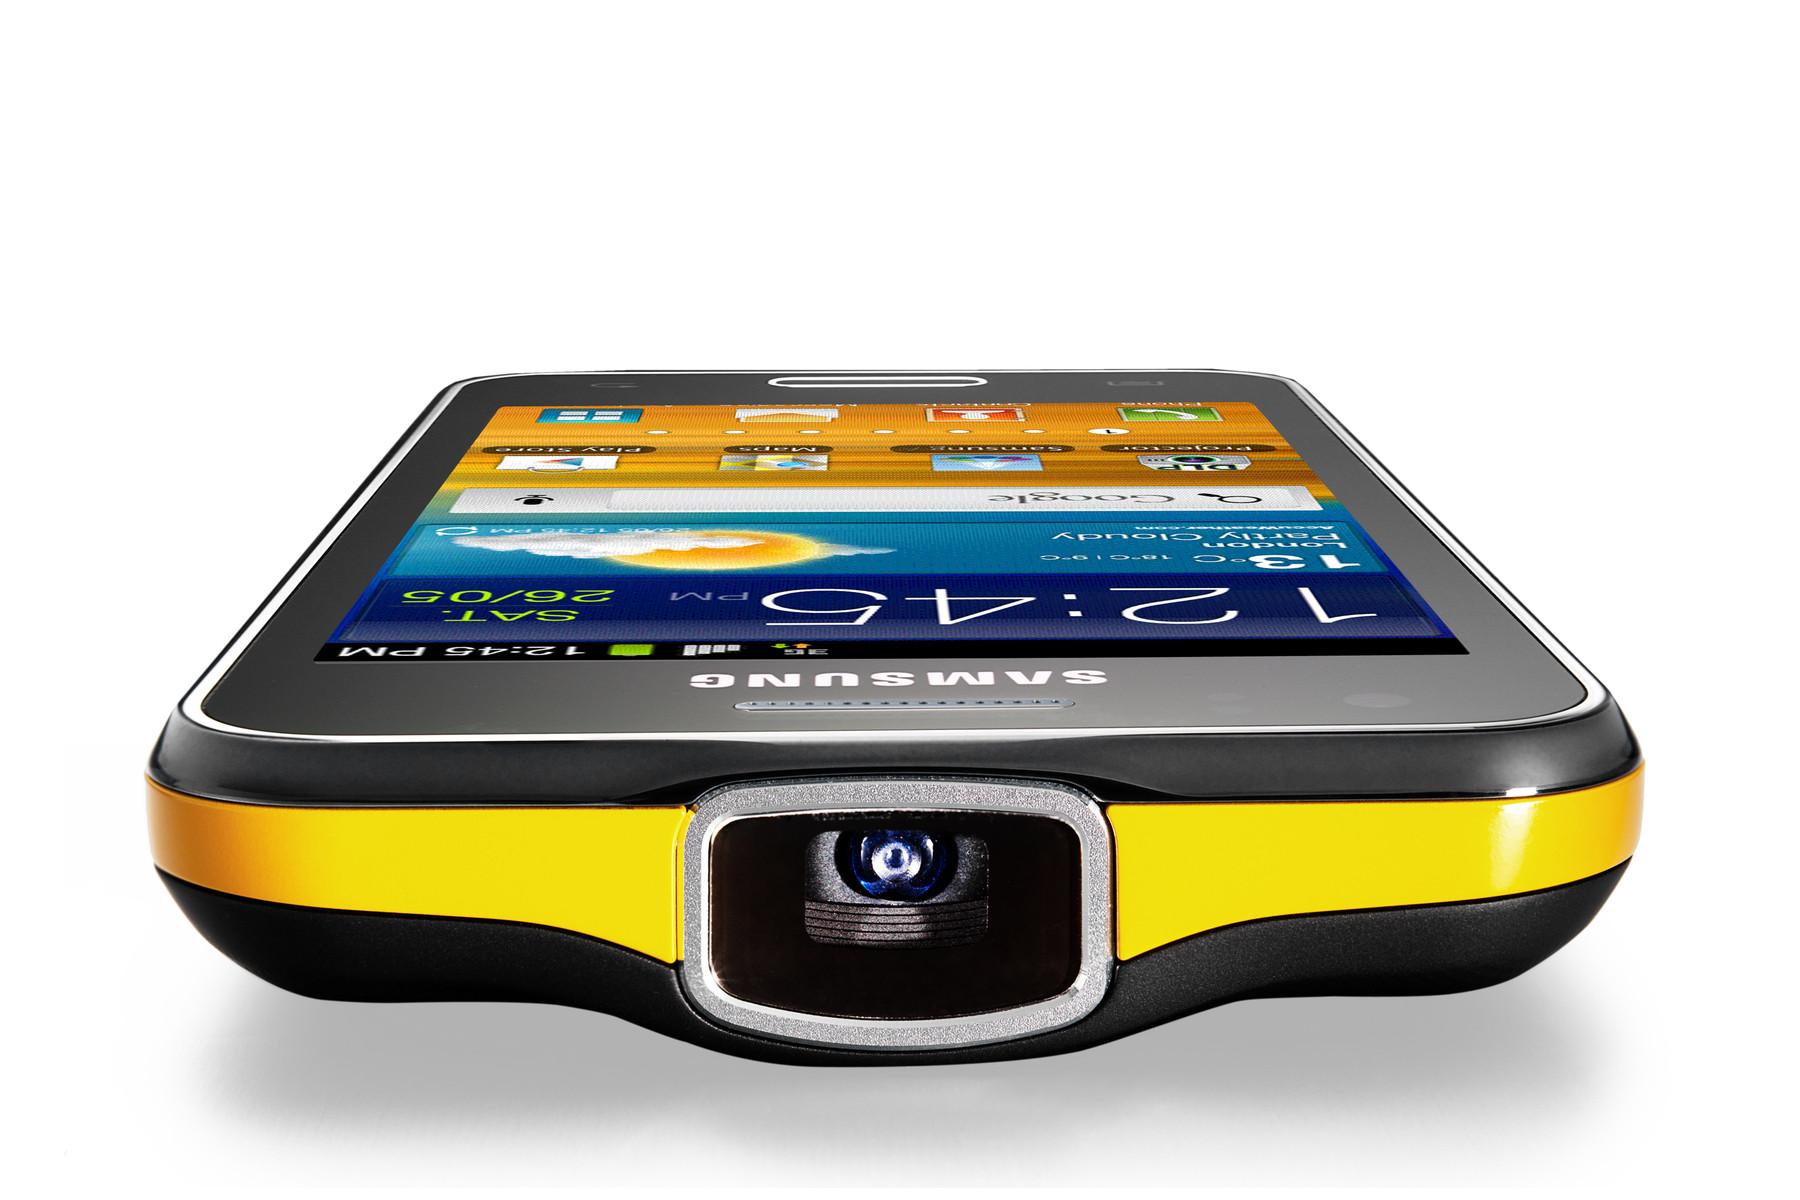 Review Samsung Galaxy Beam Gt I8530 Smartphone